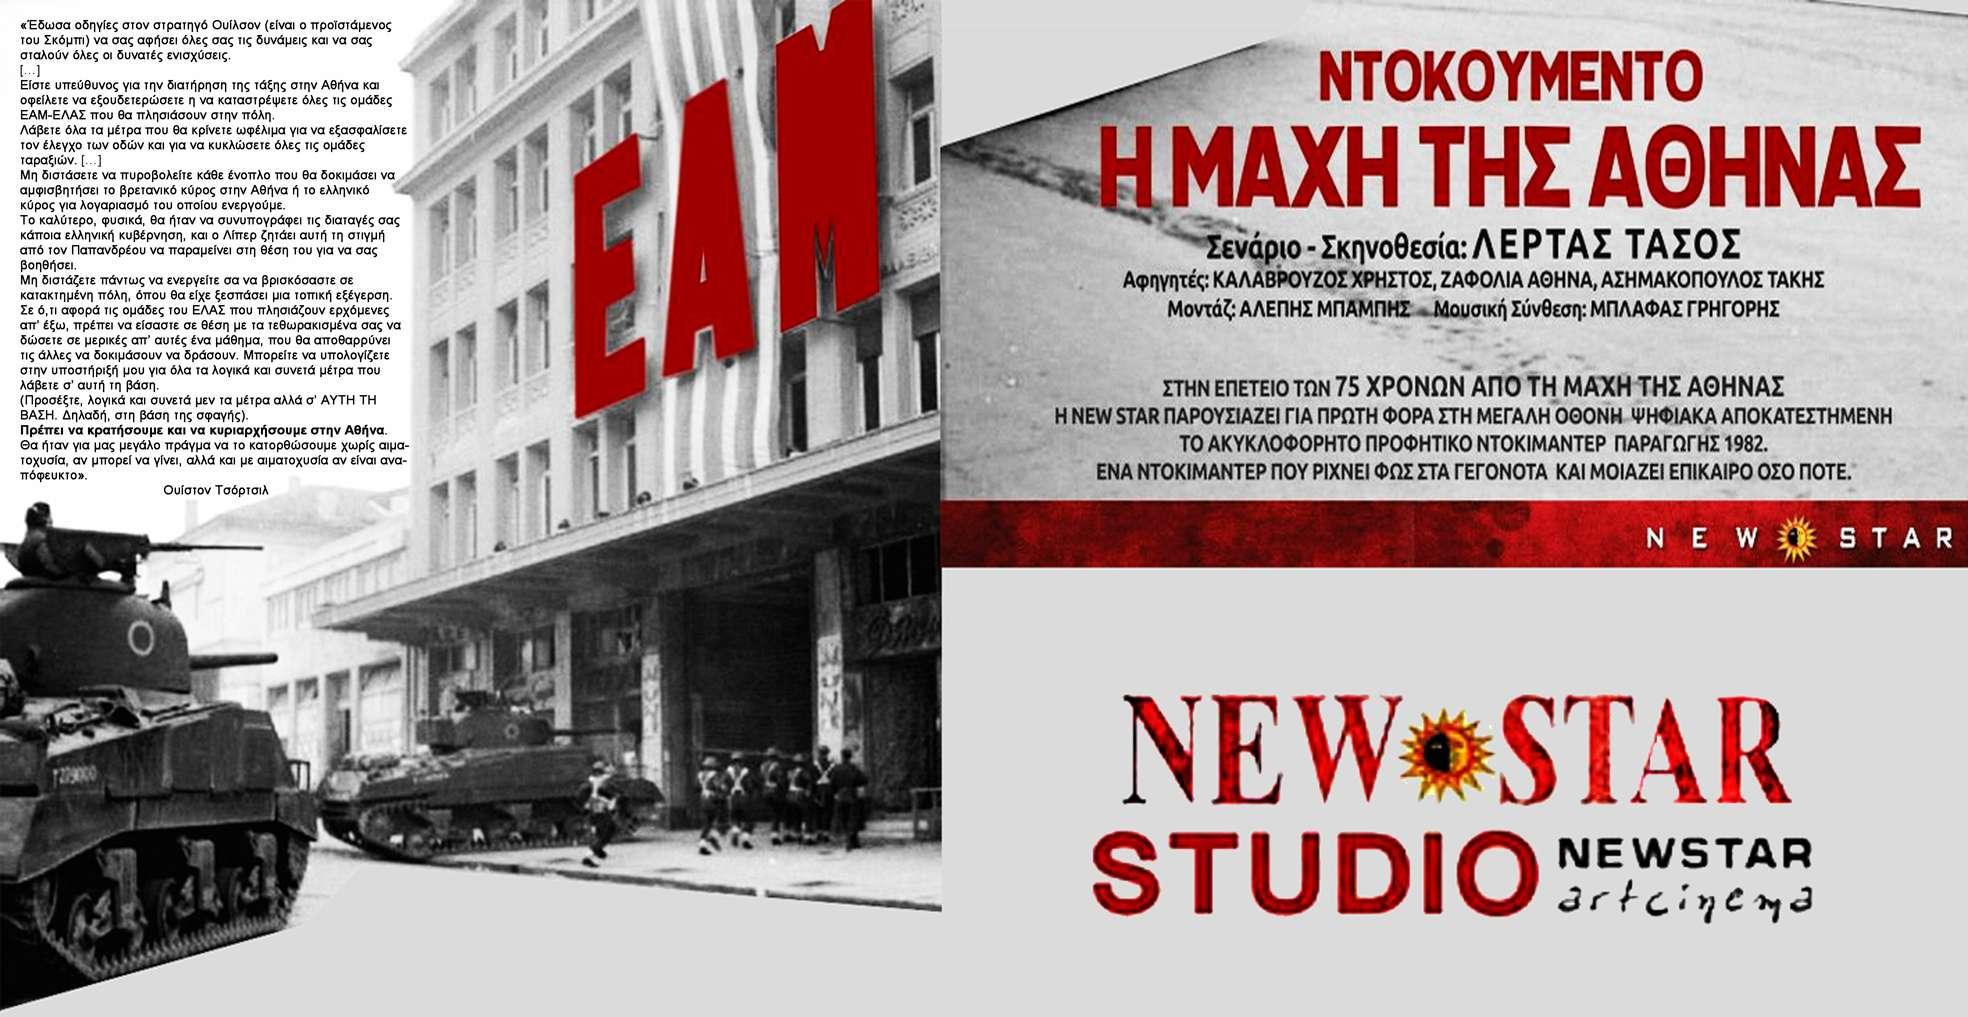 Nτοκιμαντέρ Τάσσου Λέρτα Ντοκουμέντο η μάχη της Αθήνας στο STUDIO